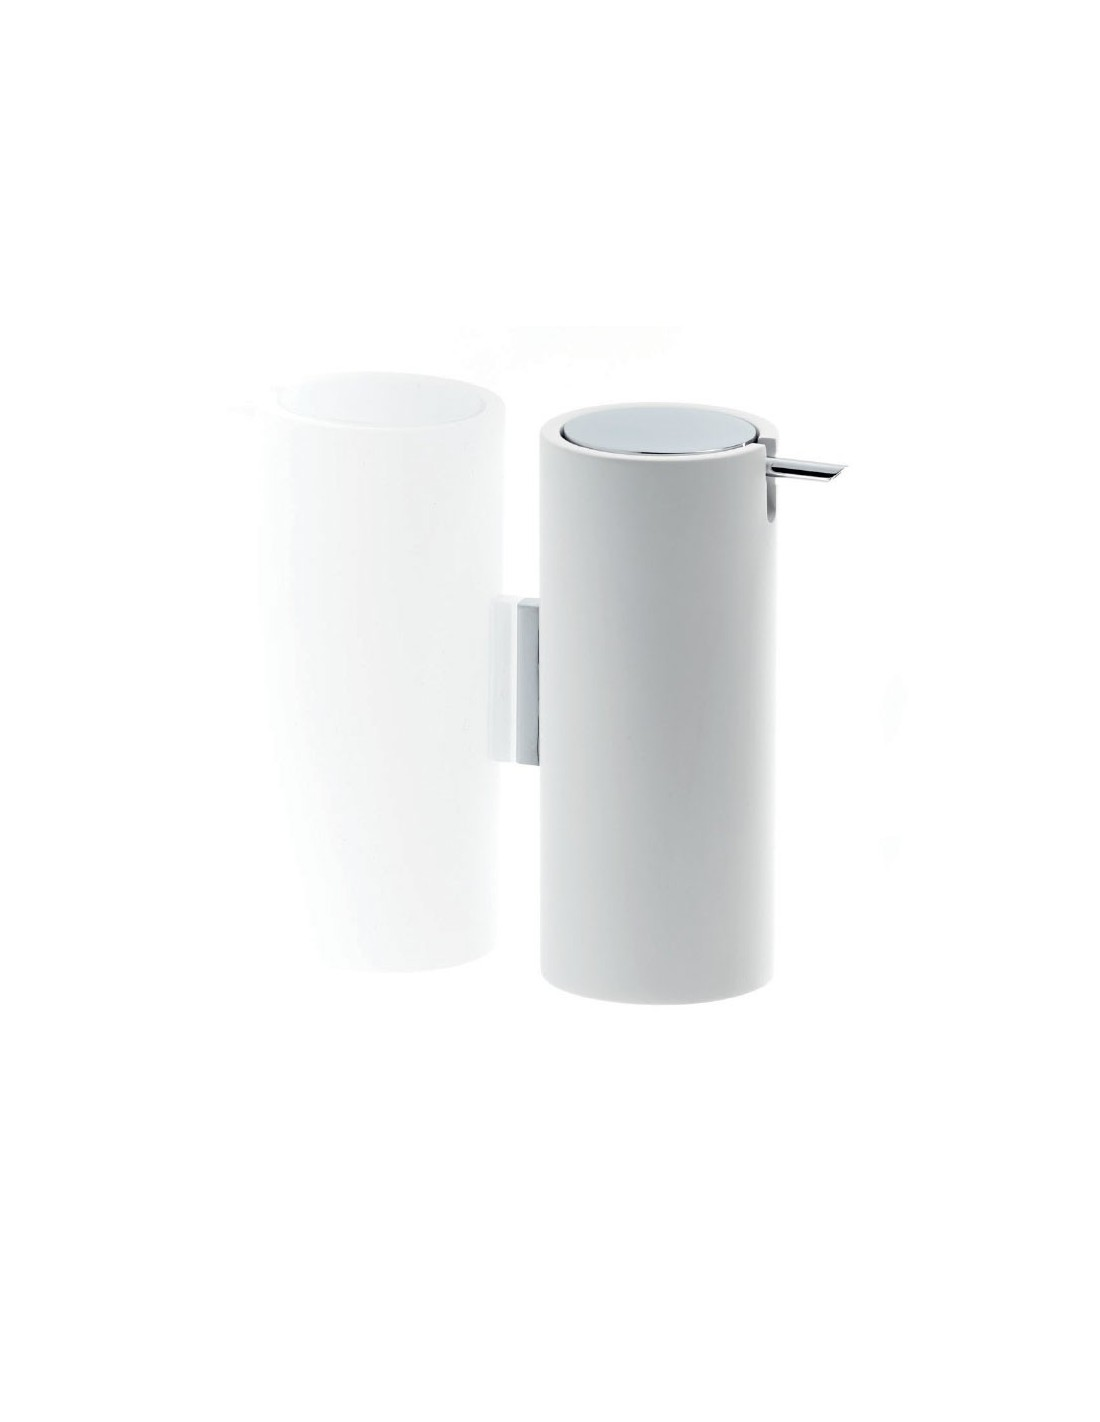 Distributeur de savon liquide mural STONE blanc Decor Walther